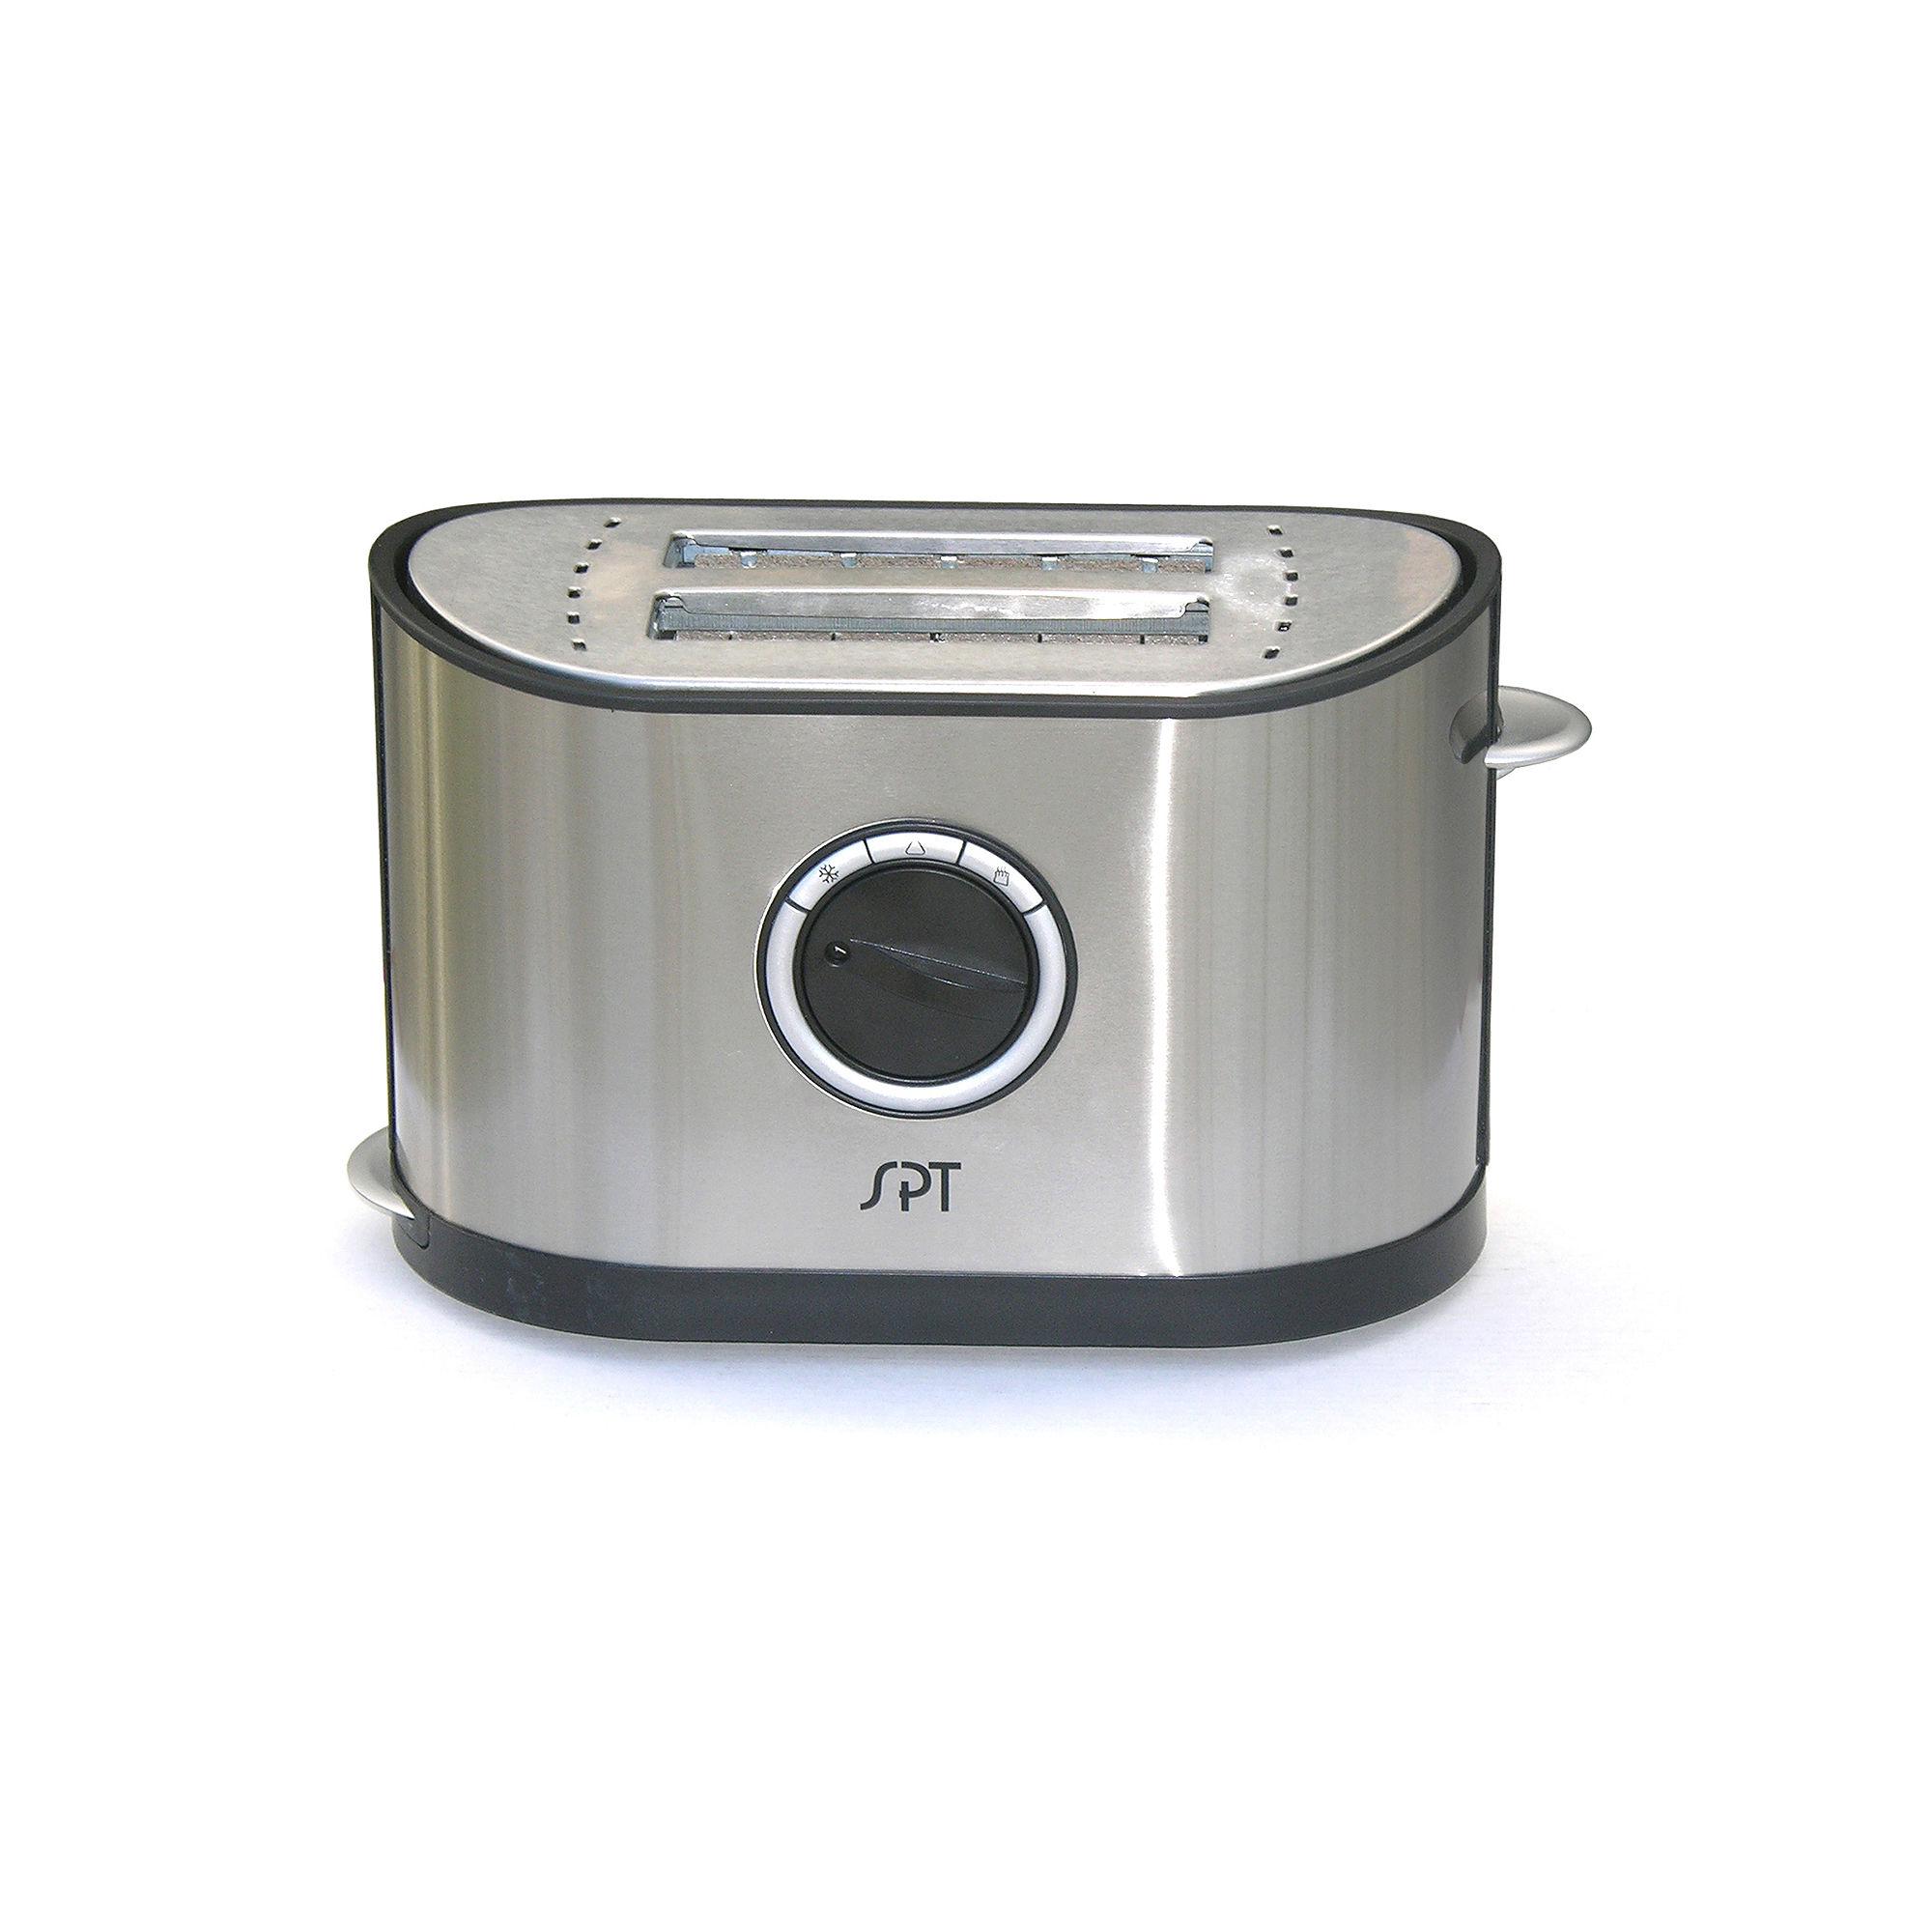 SPT Stainless Steel Toaster